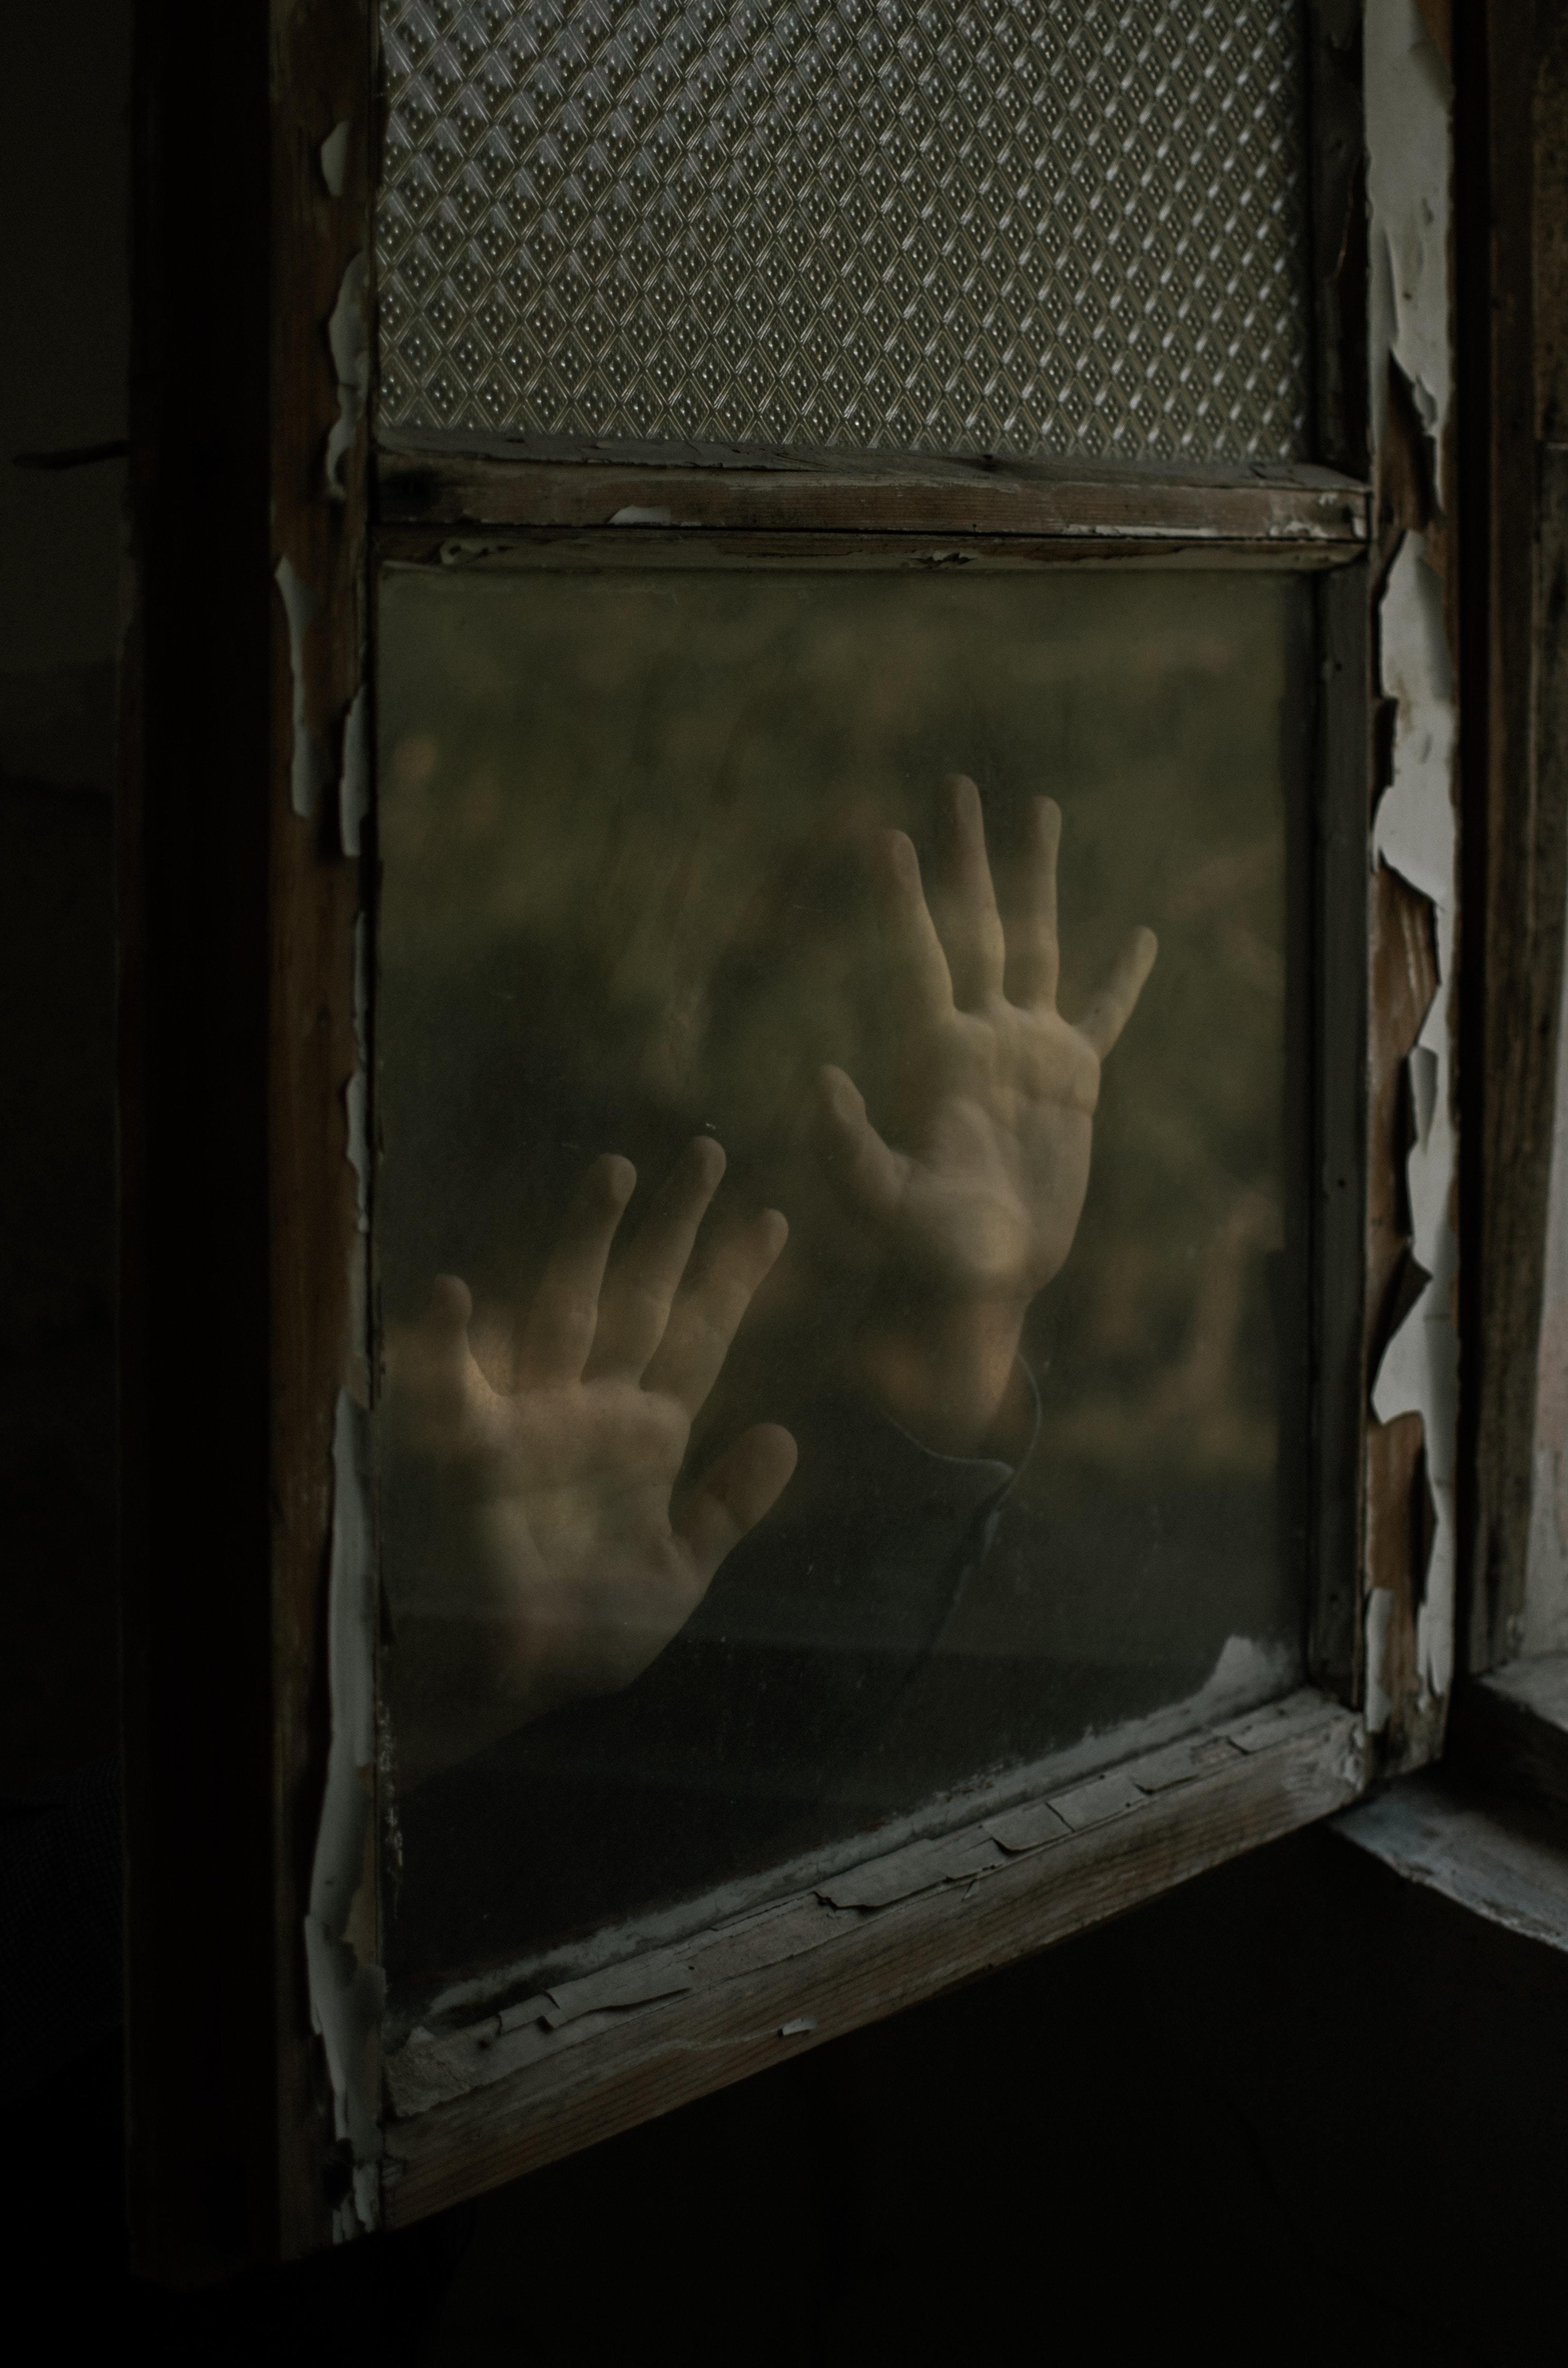 Hands on a window